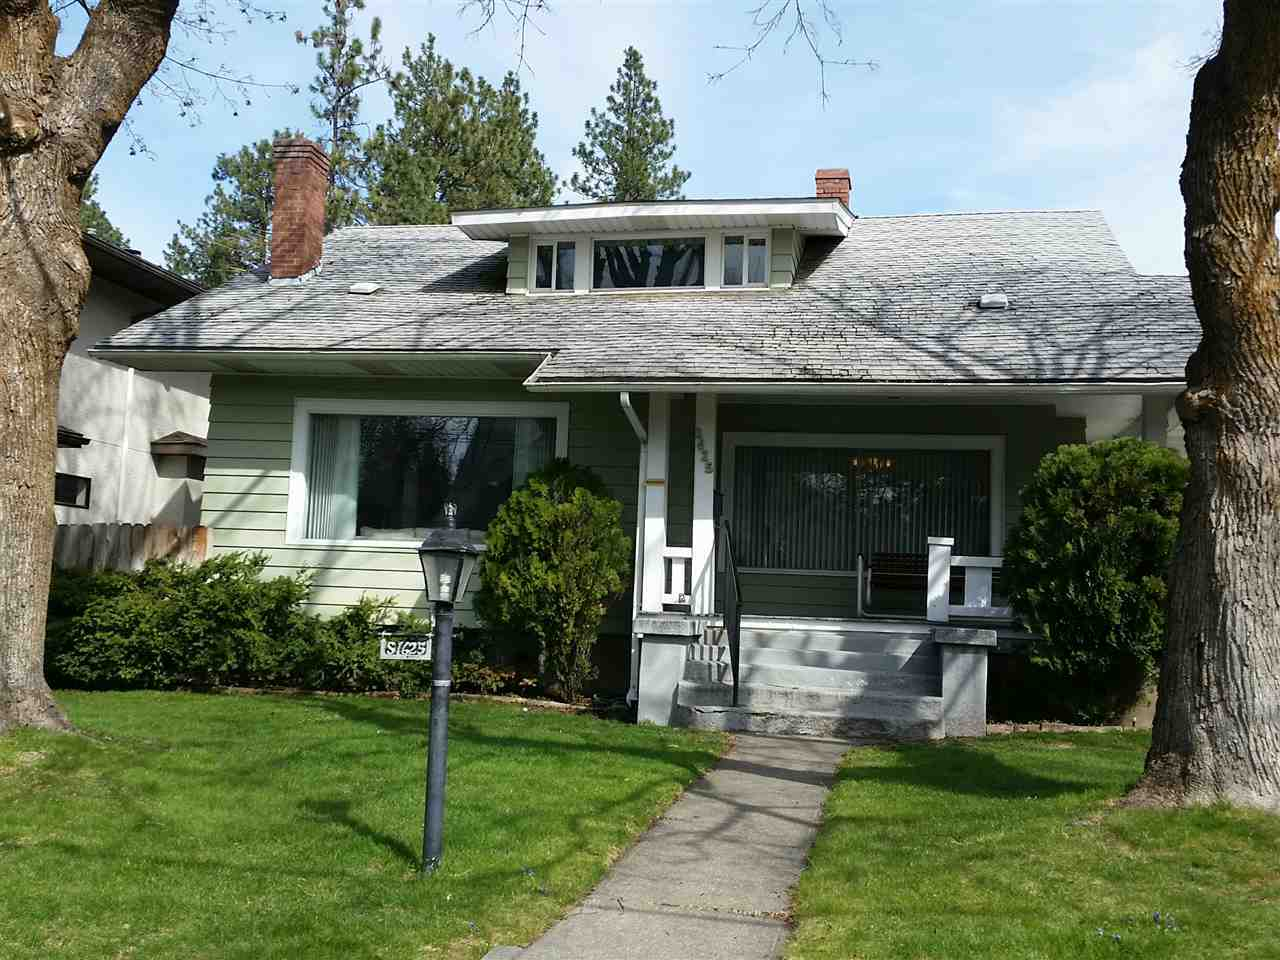 1625 S Division St, Spokane, WA - USA (photo 1)